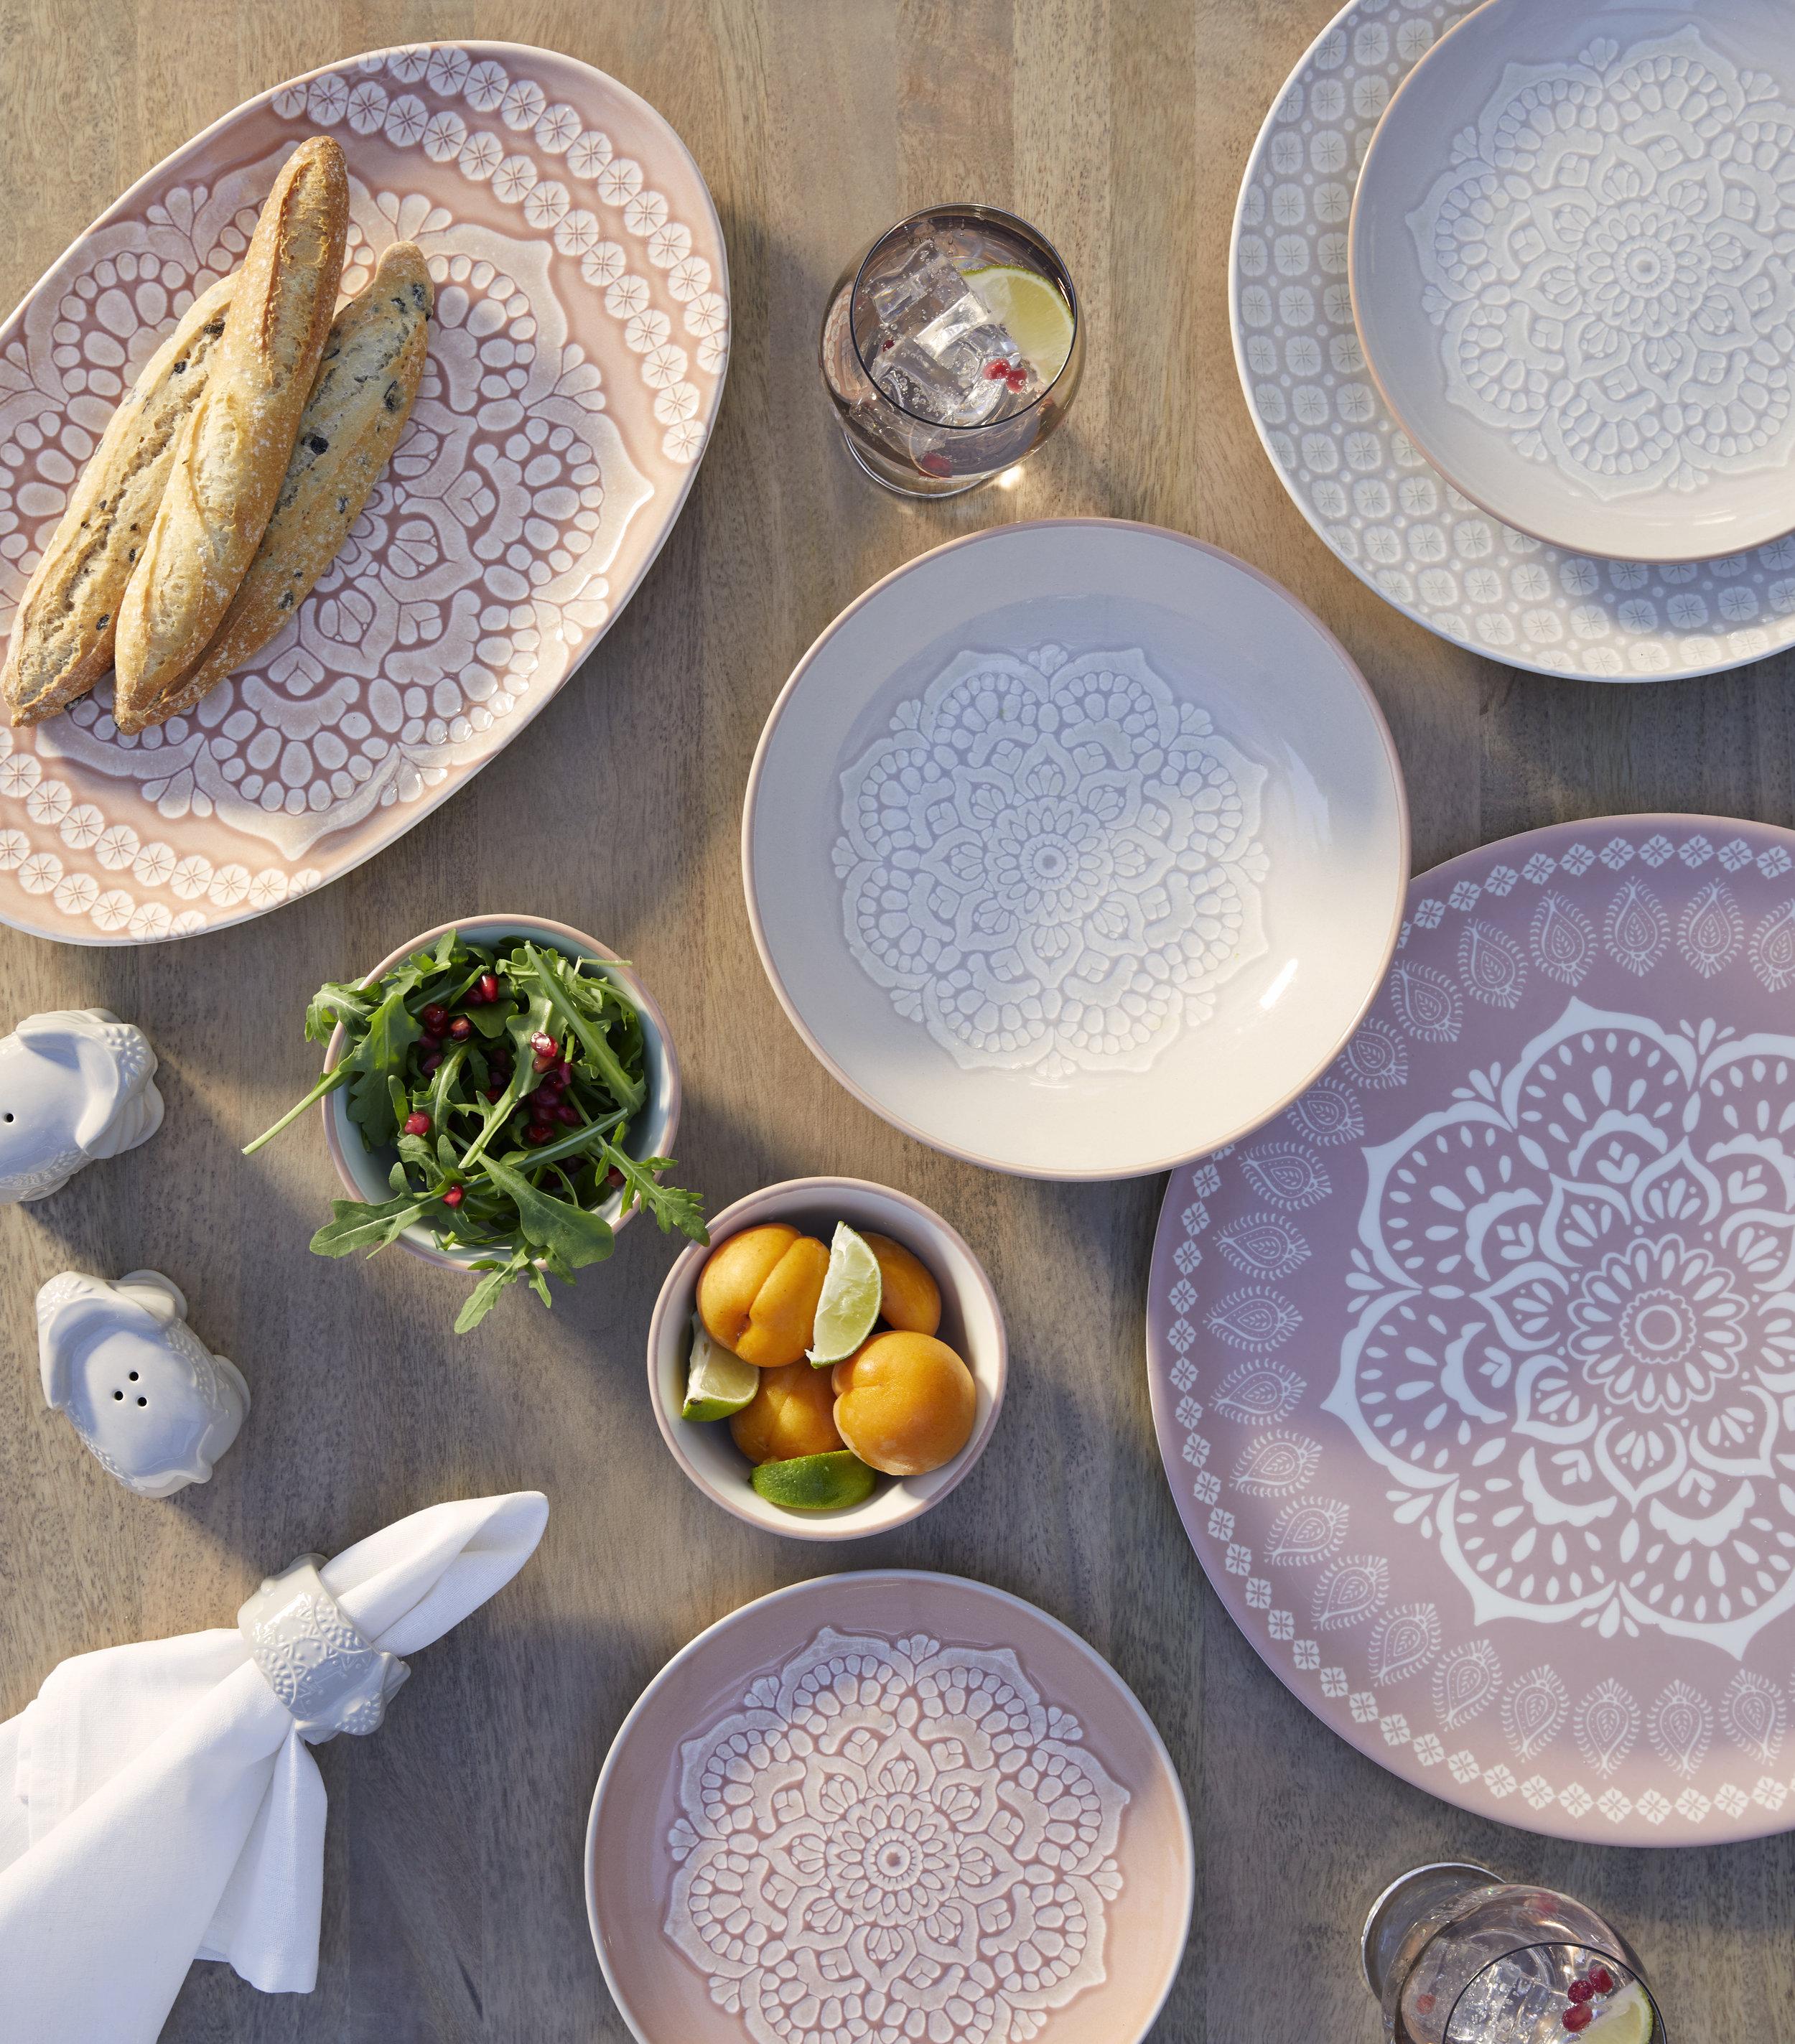 Cinnabar platter, £8 Pasta bowl, £6 Dinner plate, £4.50 Side plate, £3.50 Dip bowls, £3 each Elephant salt and pepper shakers, £6 Elephant napkin rings (set of 2), £8.  Photo: Dunelm.